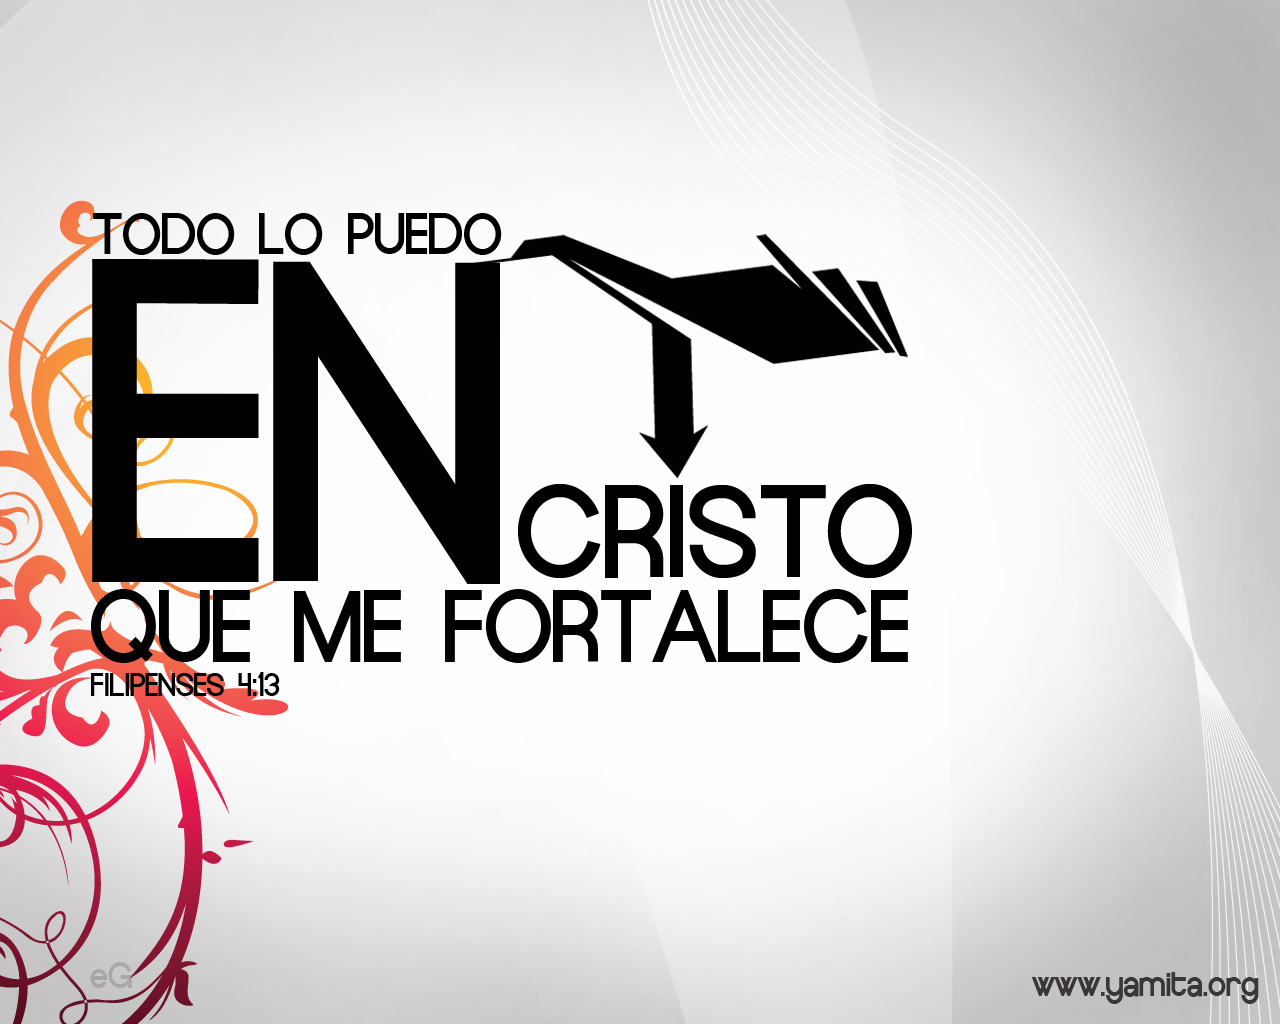 https://1.bp.blogspot.com/-wVFr--3_yI8/Th4AVIoBsQI/AAAAAAAAFNU/xzLu5FyecLk/s1600/Todo+lo+puedo+en+Cristo+que+me+fortalece+Filipenses+4_13.jpg